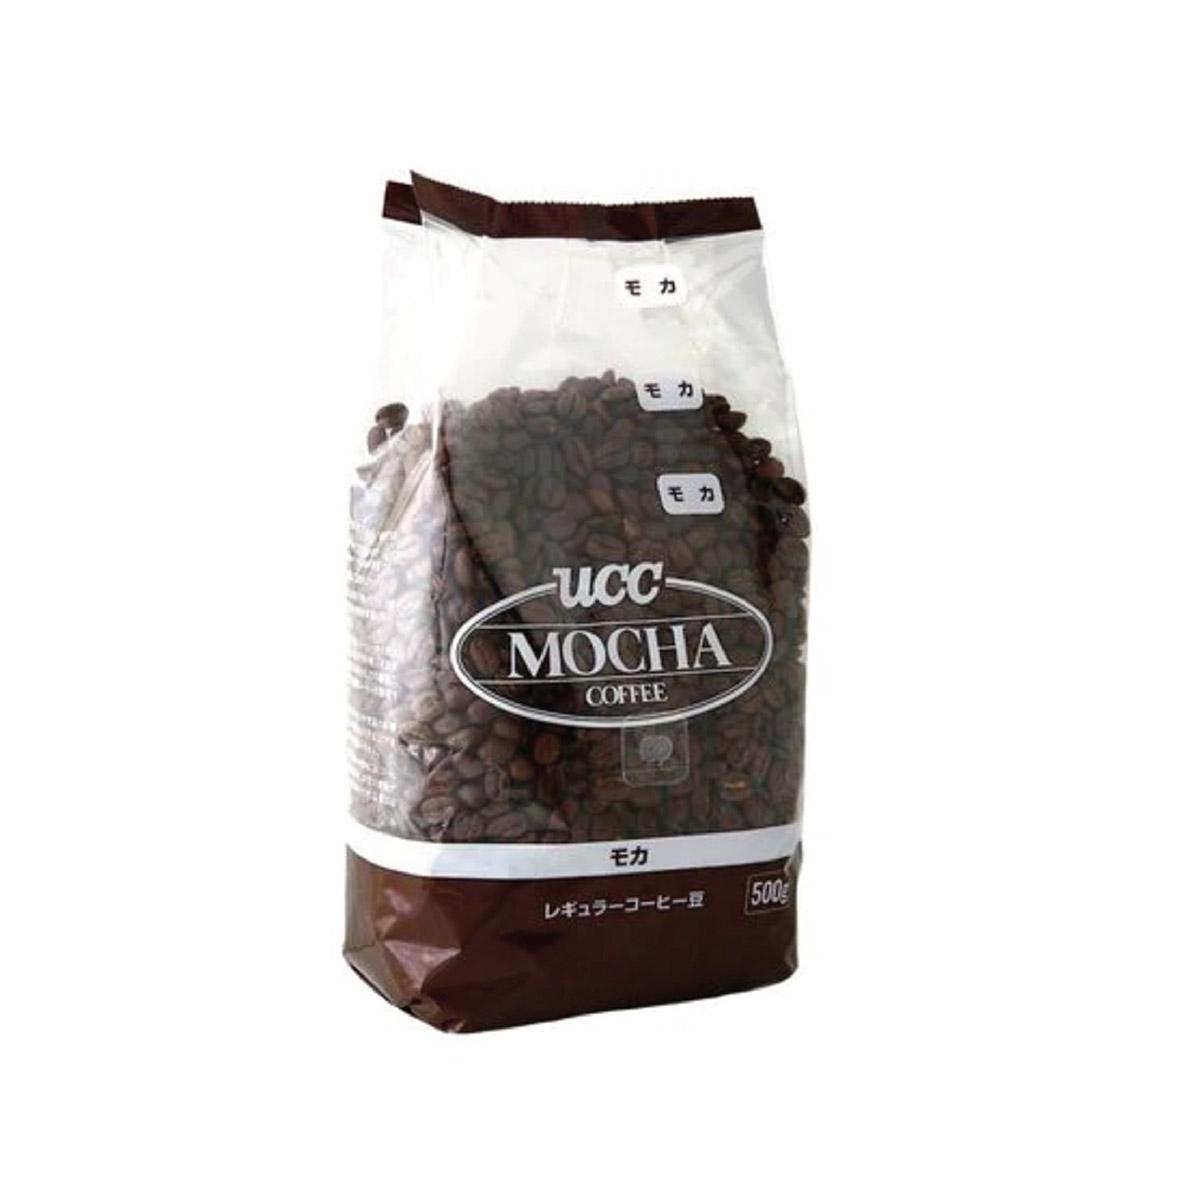 UCC Mocha Coffee